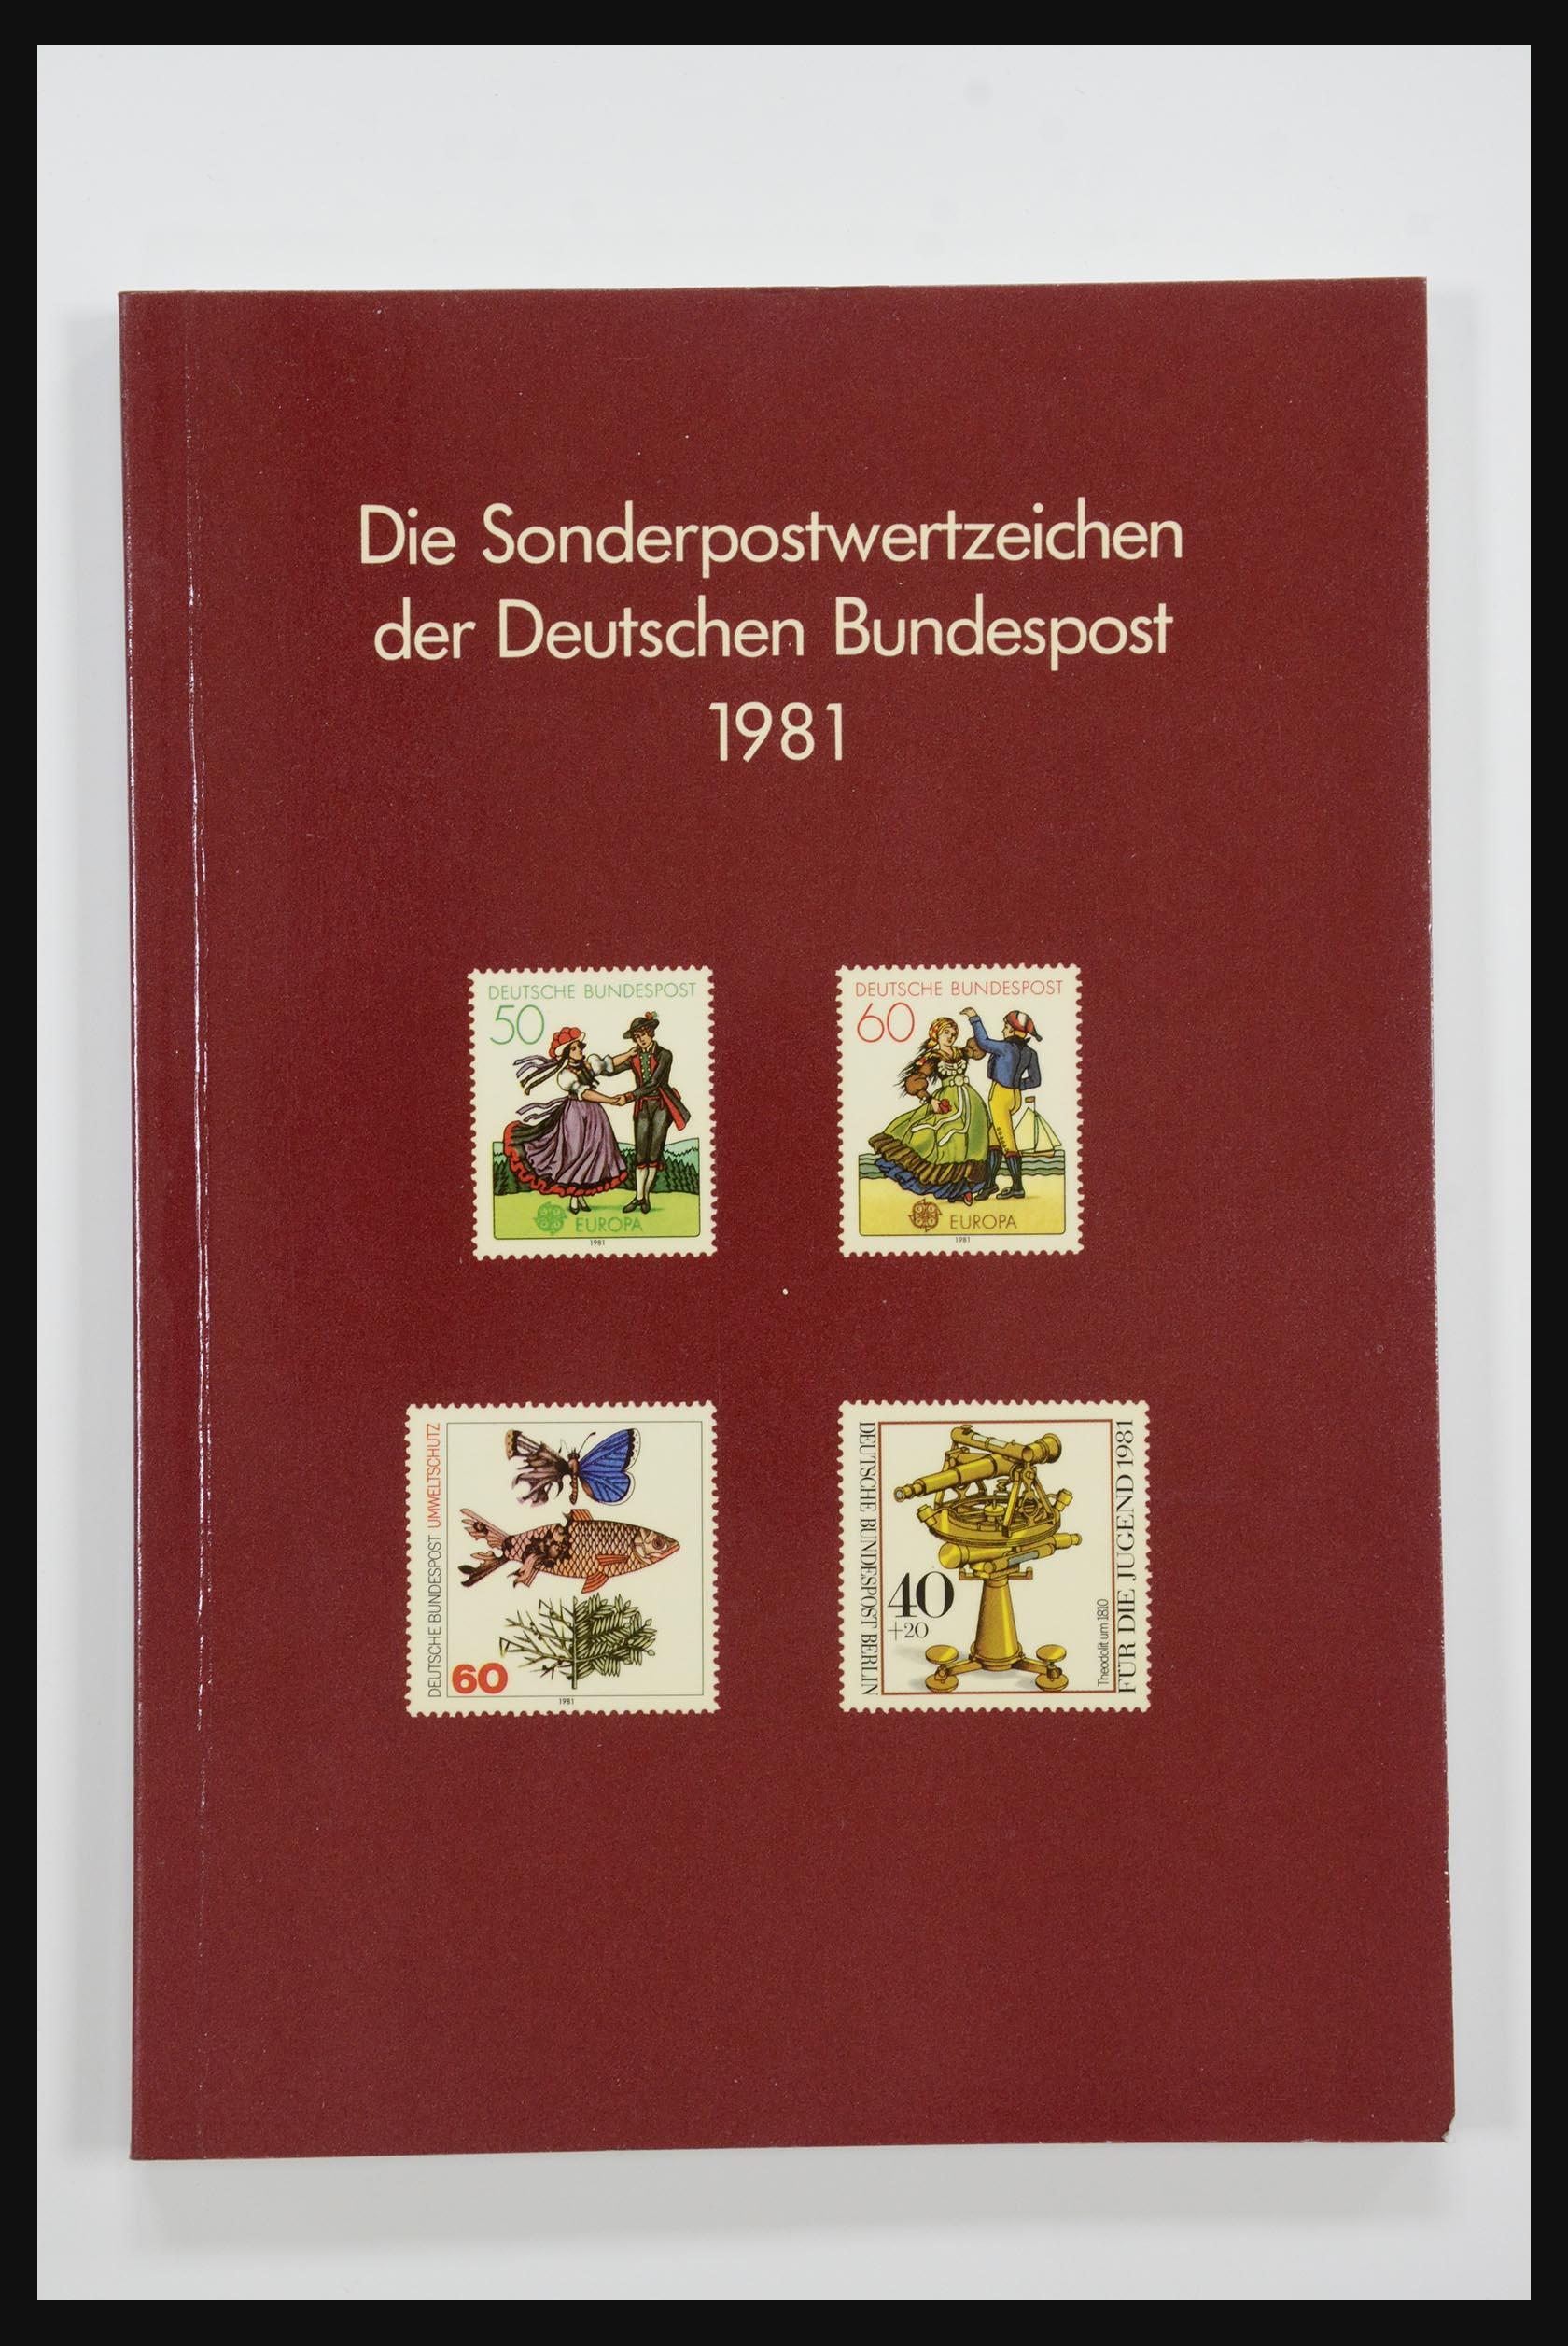 31834 009 - 31834 Bundespost yearbooks 1973(!)-1999.